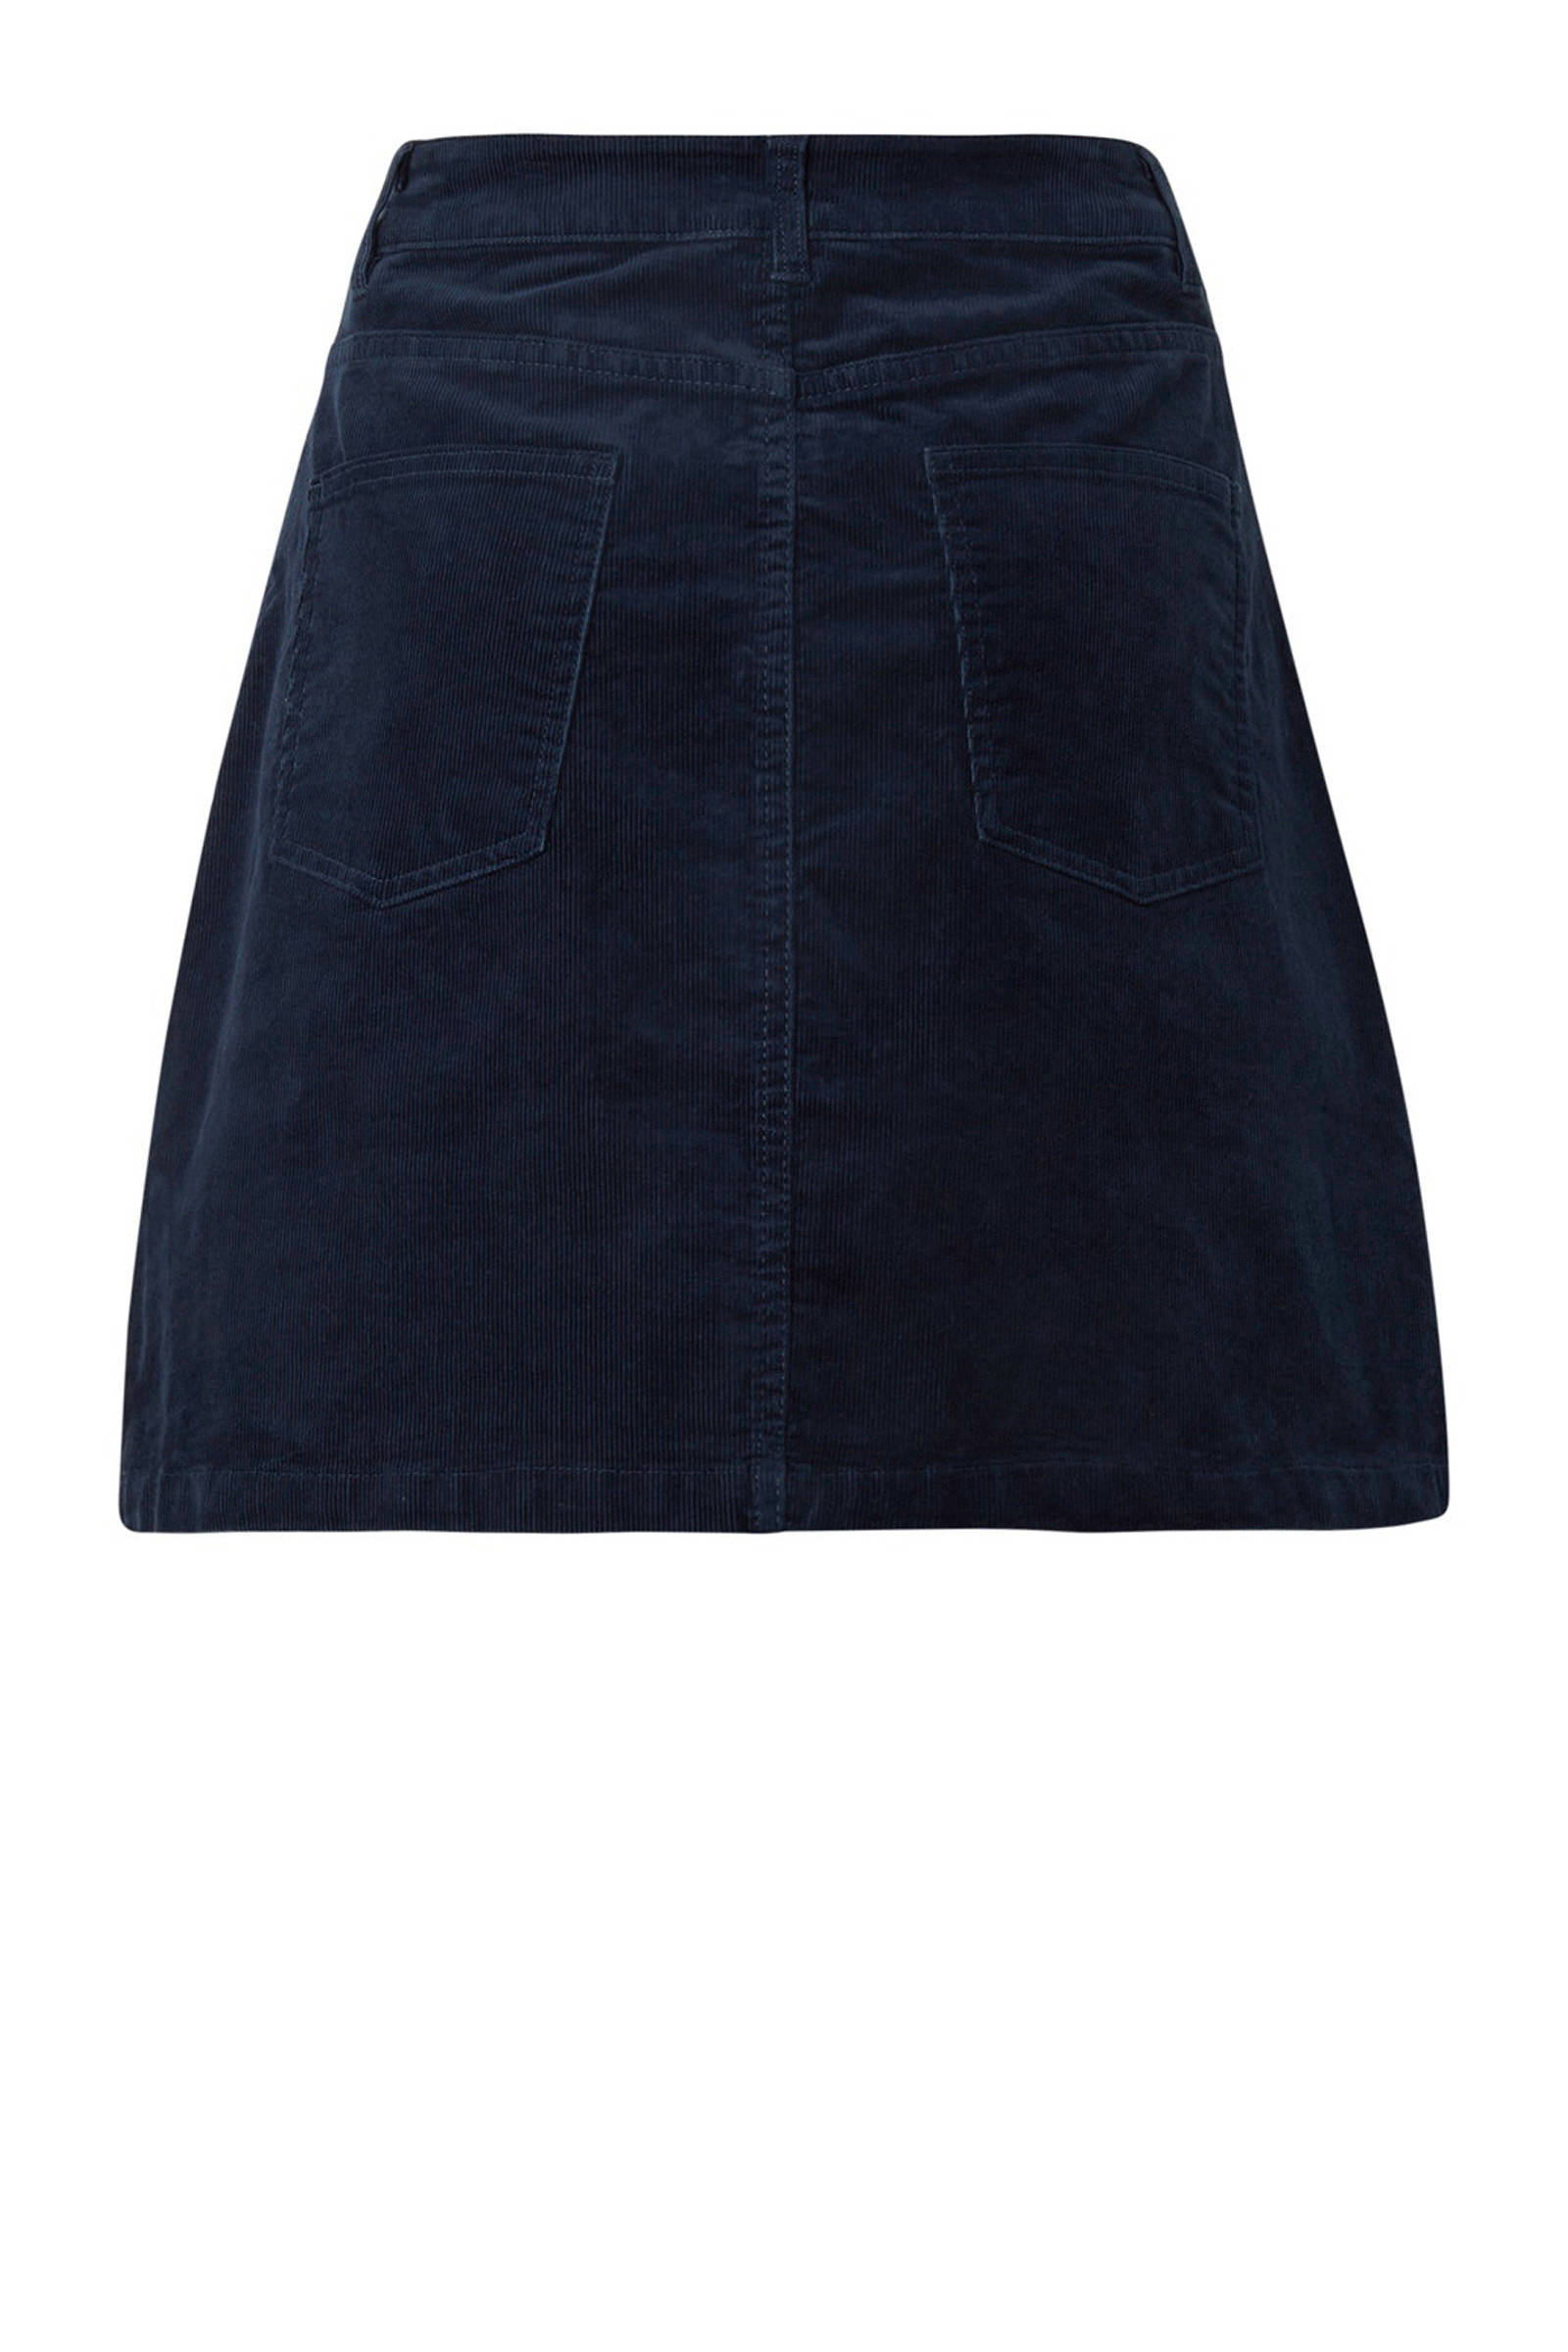 Tom Tailor Denim corduroy rok donkerblauw